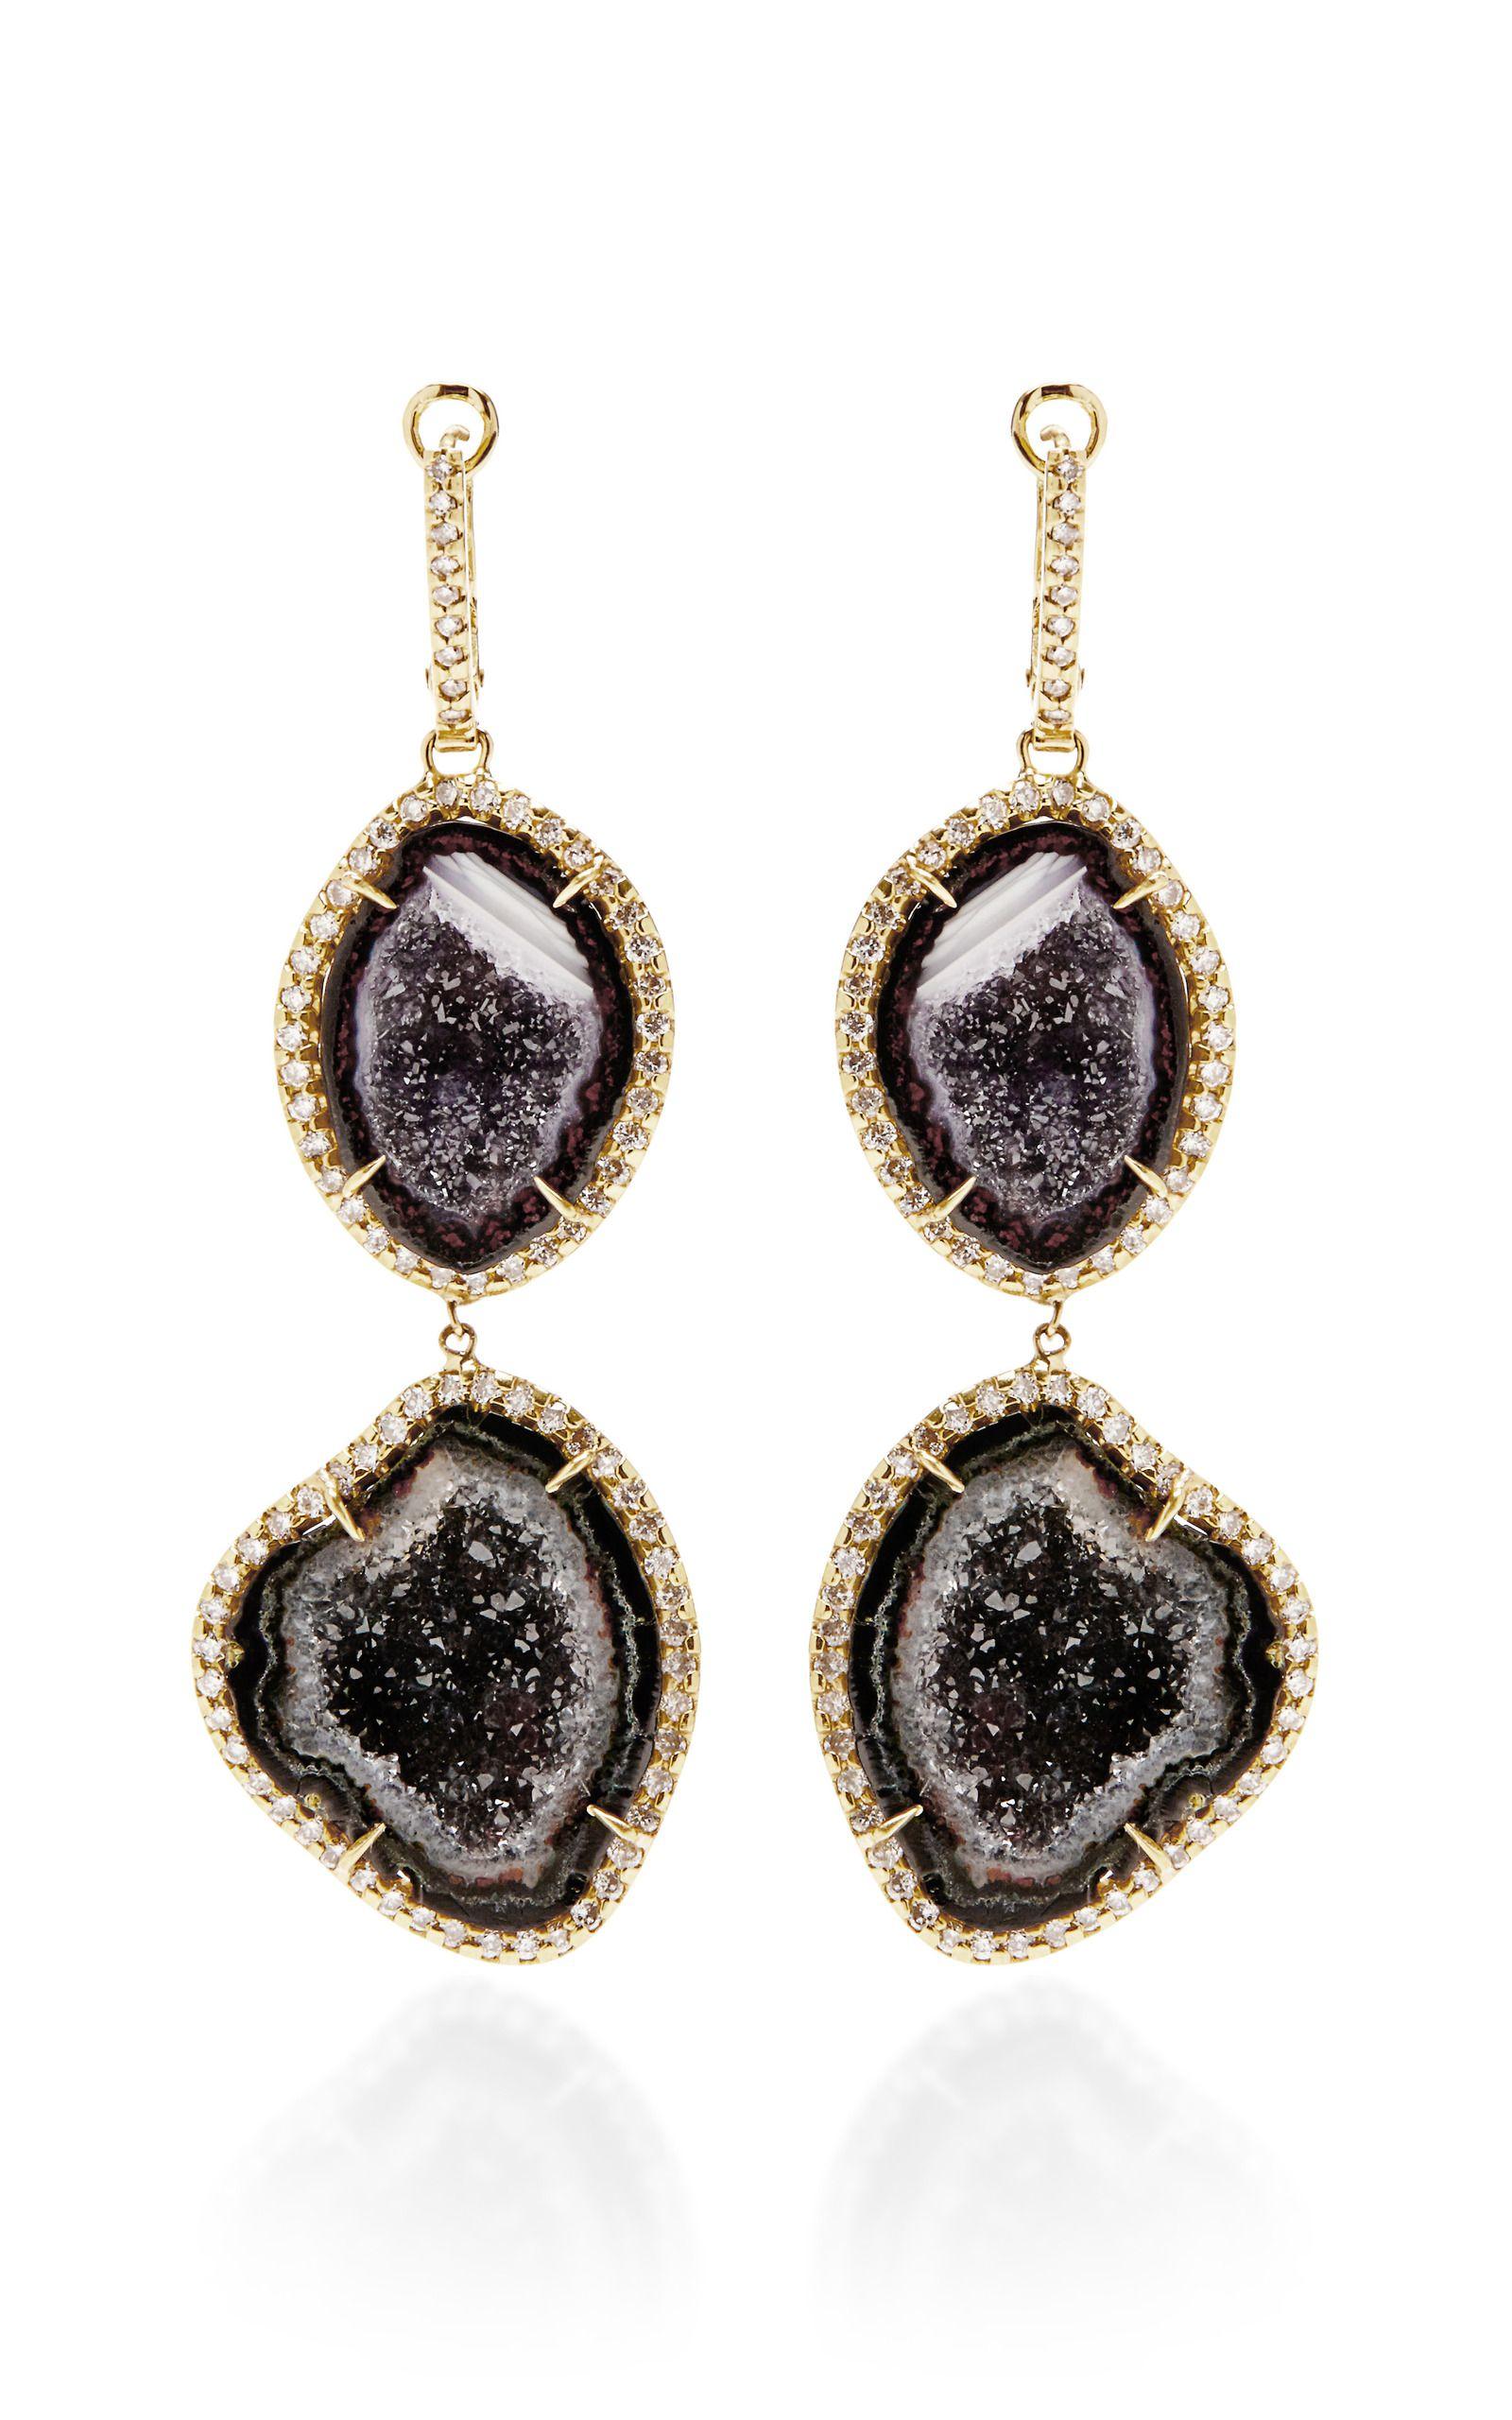 18-karat Rose Gold Geode Earrings - one size Kimberly McDonald 305vXr